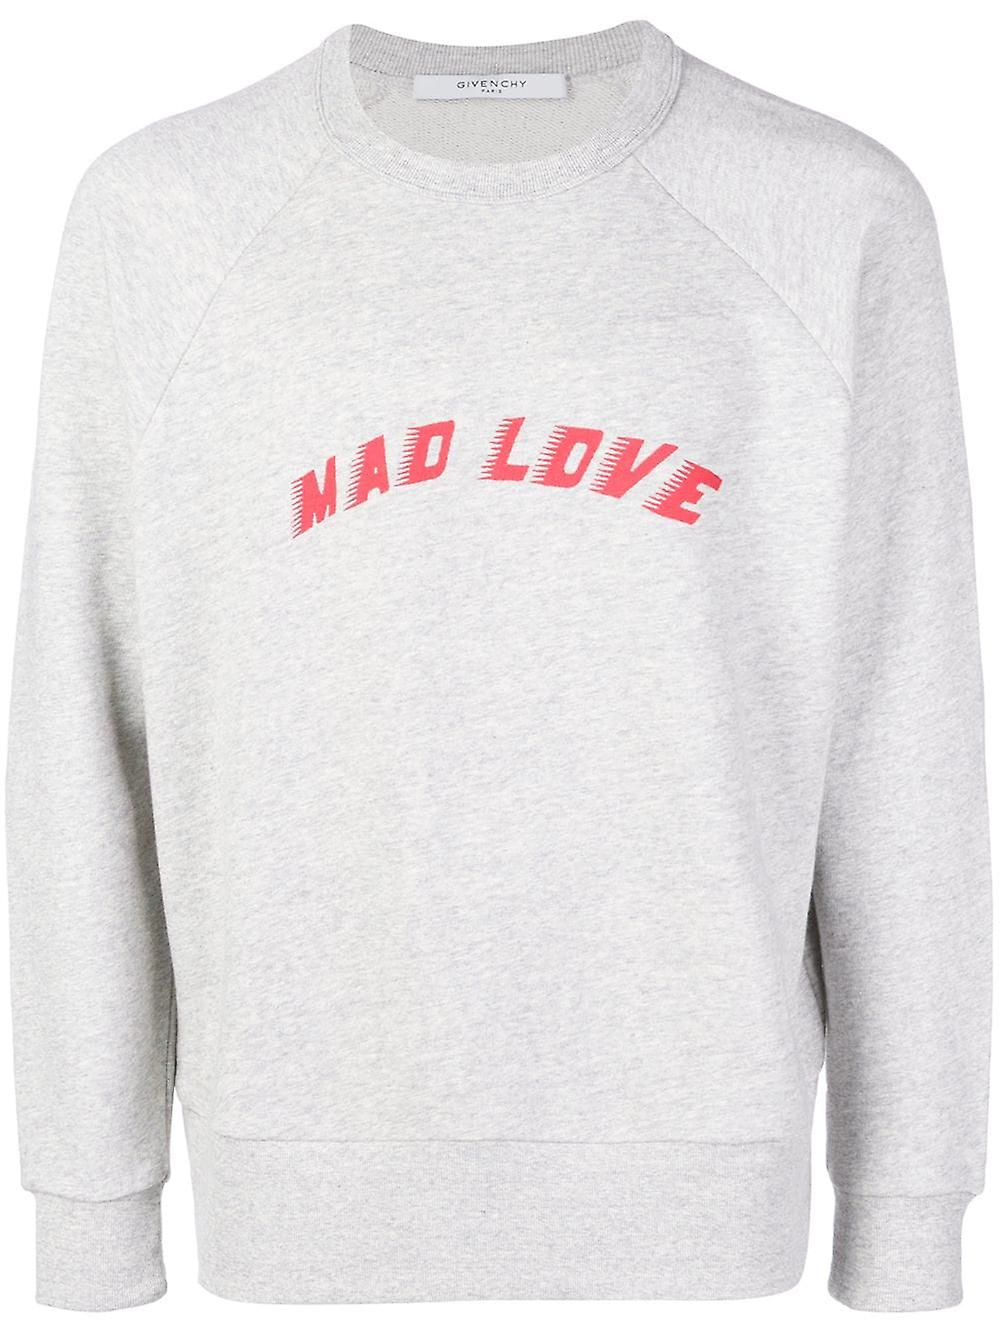 Mad Love Sweatshirt